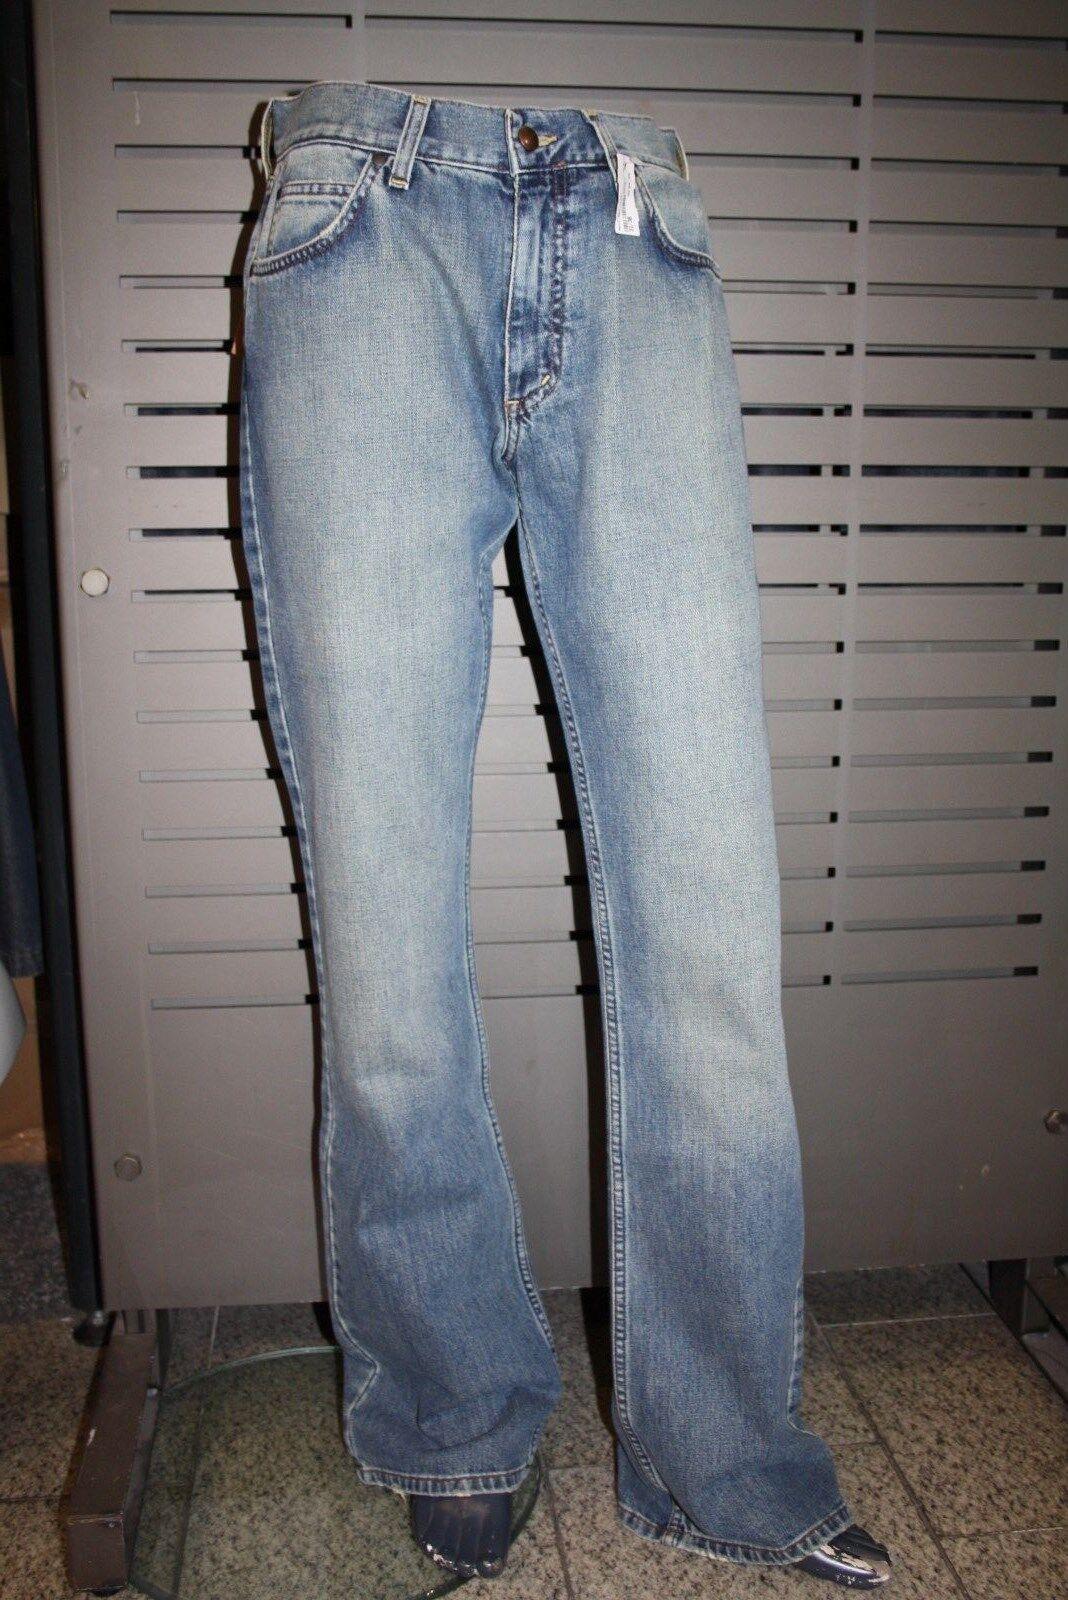 Mavi Jeans 597 Mitch Mitch Mitch a Campana Vita Bassa Stone blu Blu Nuovo Vintage 4446b6